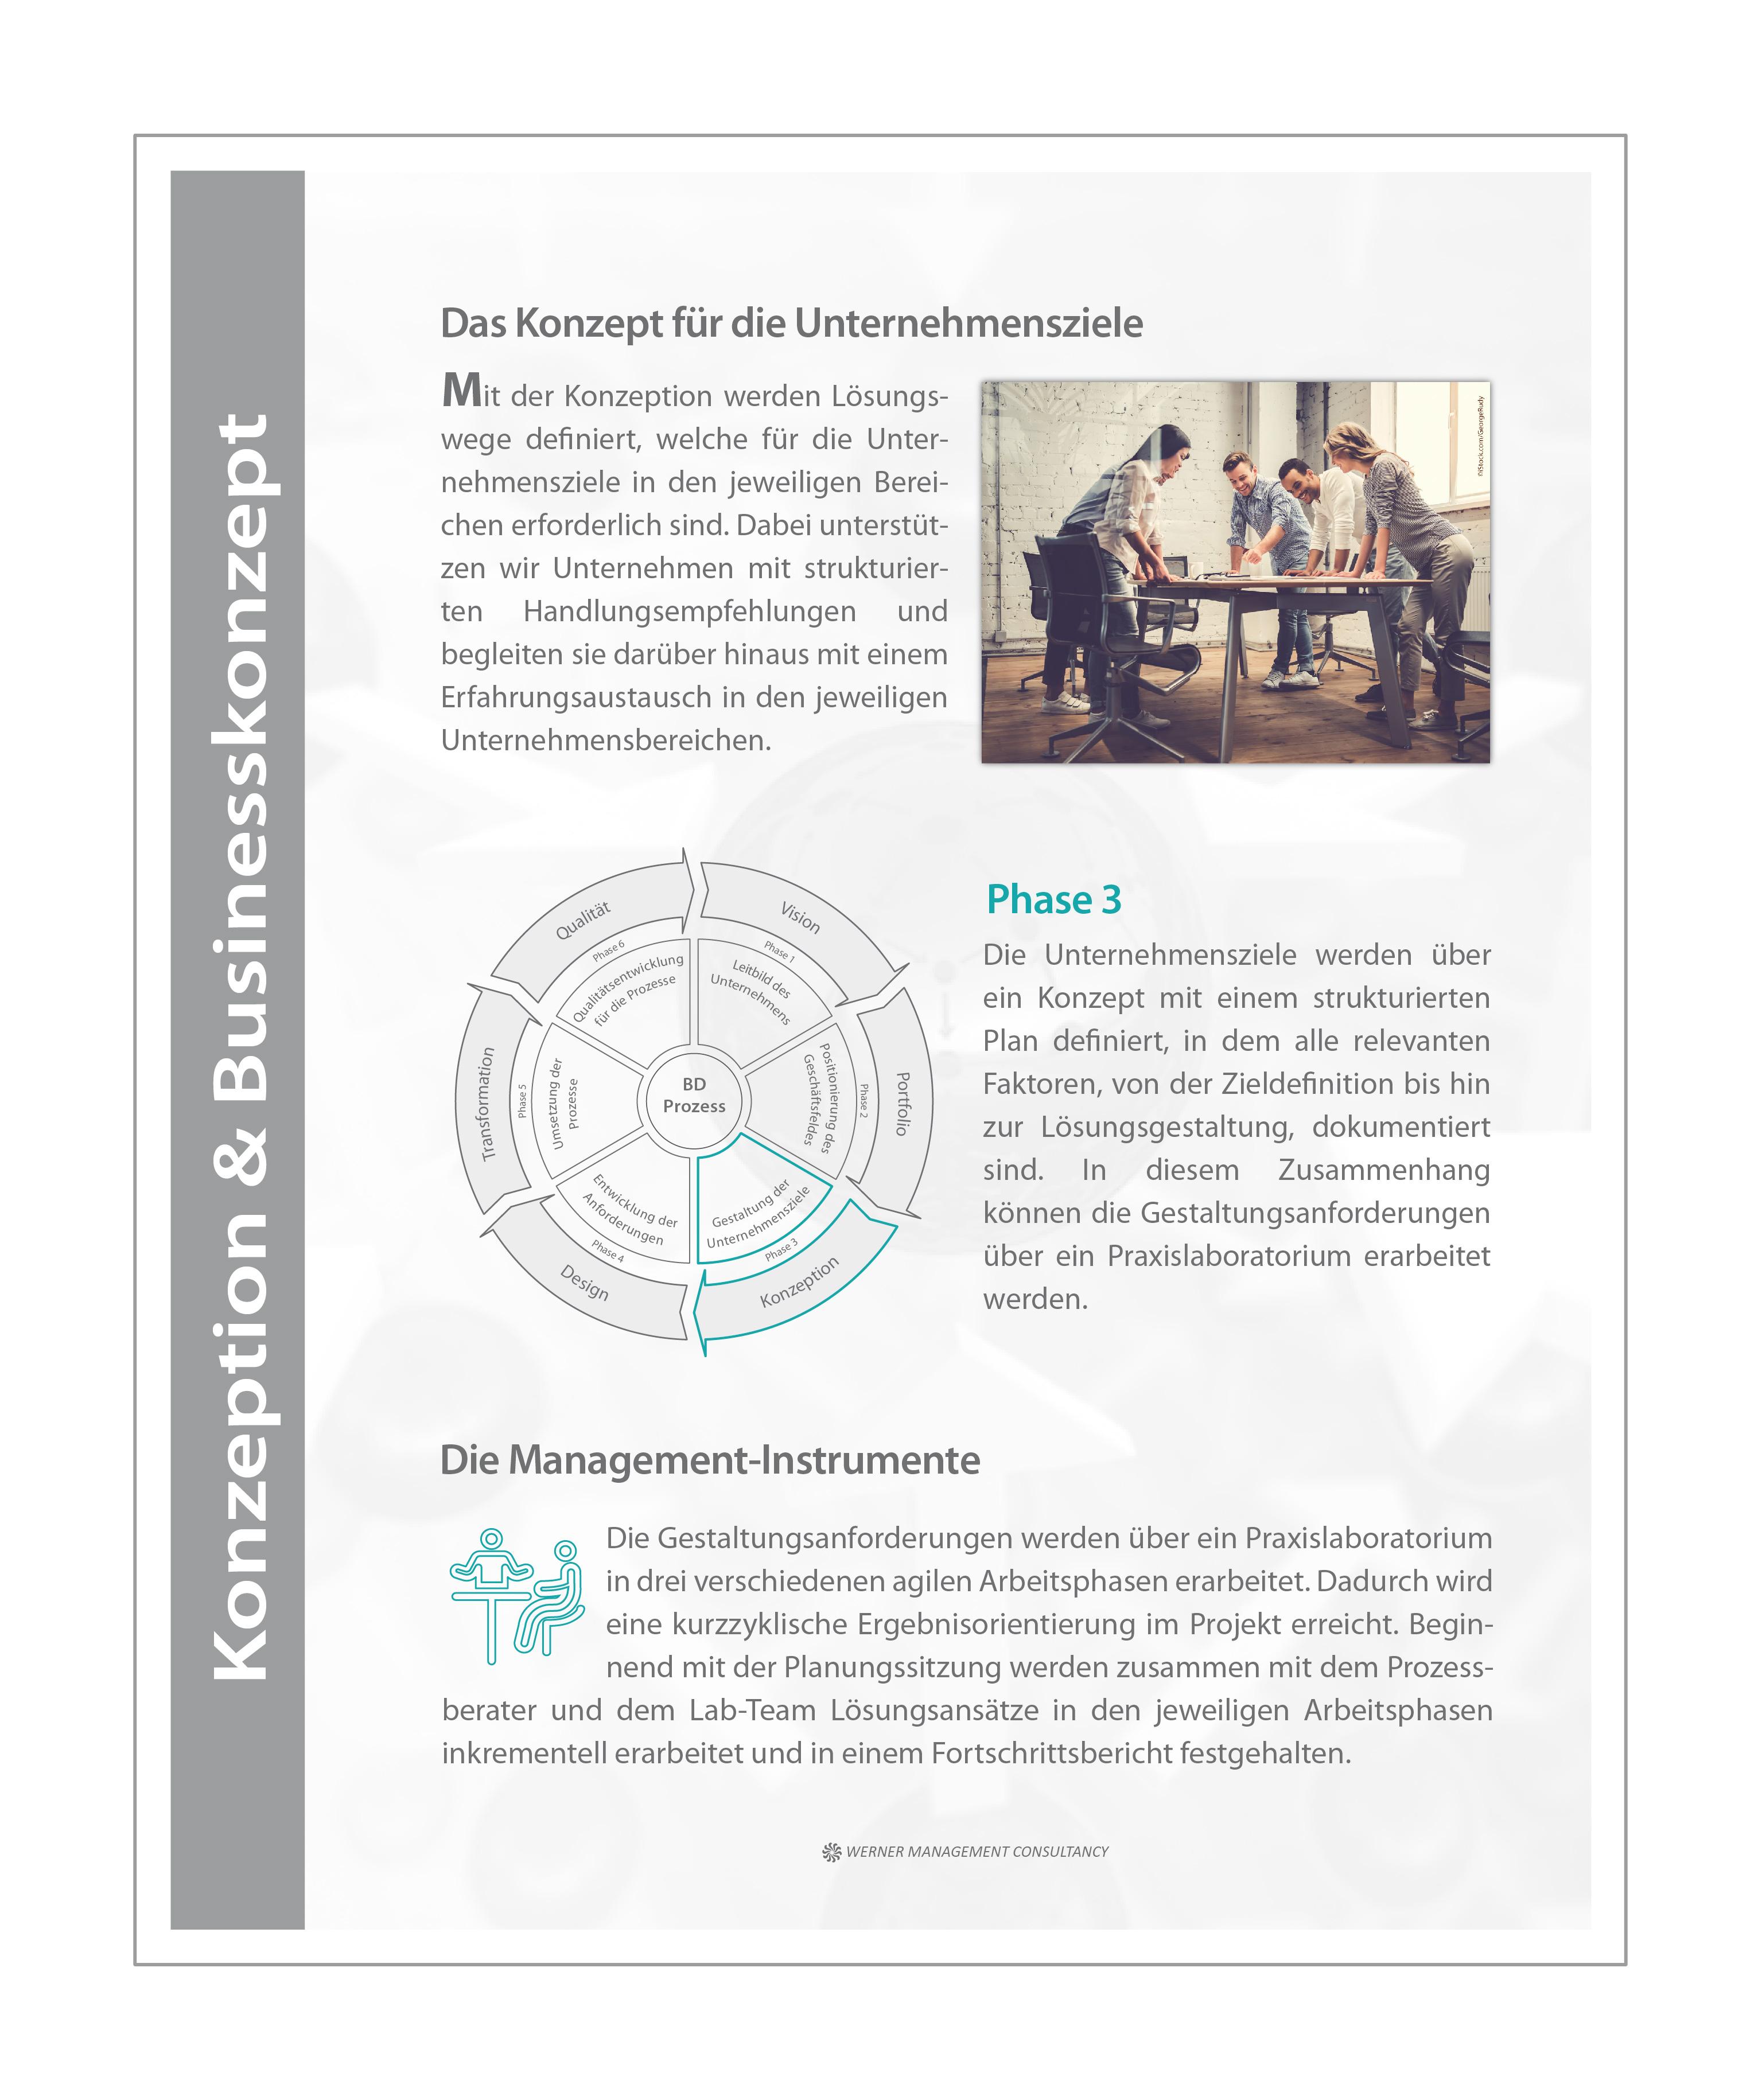 WMC Broschüre Business Development Phase-3 Prozess